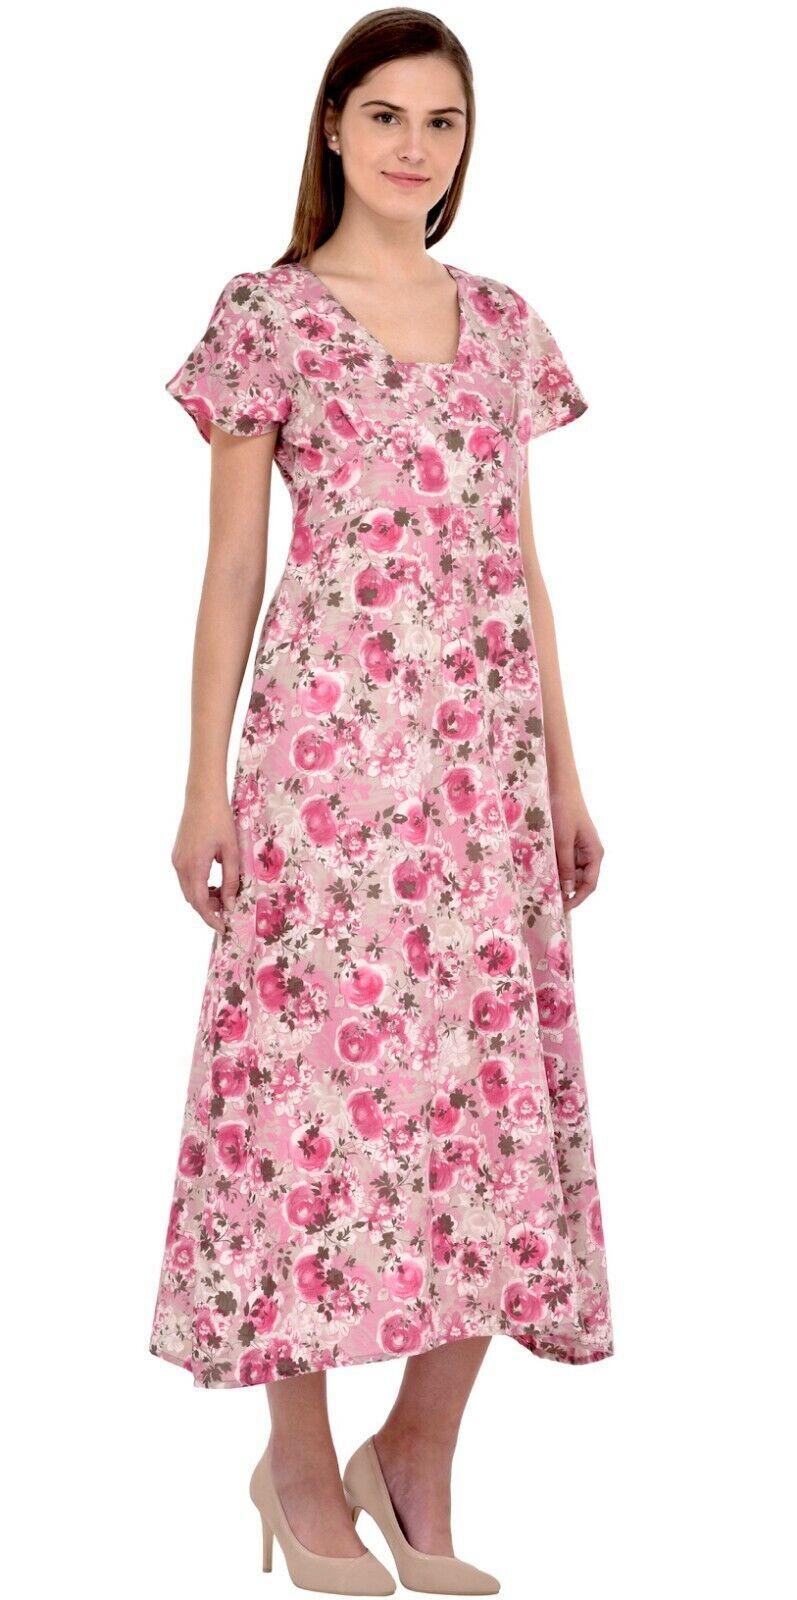 Short Sleeve Printed Pure Cotton Dress   Cotton Lane